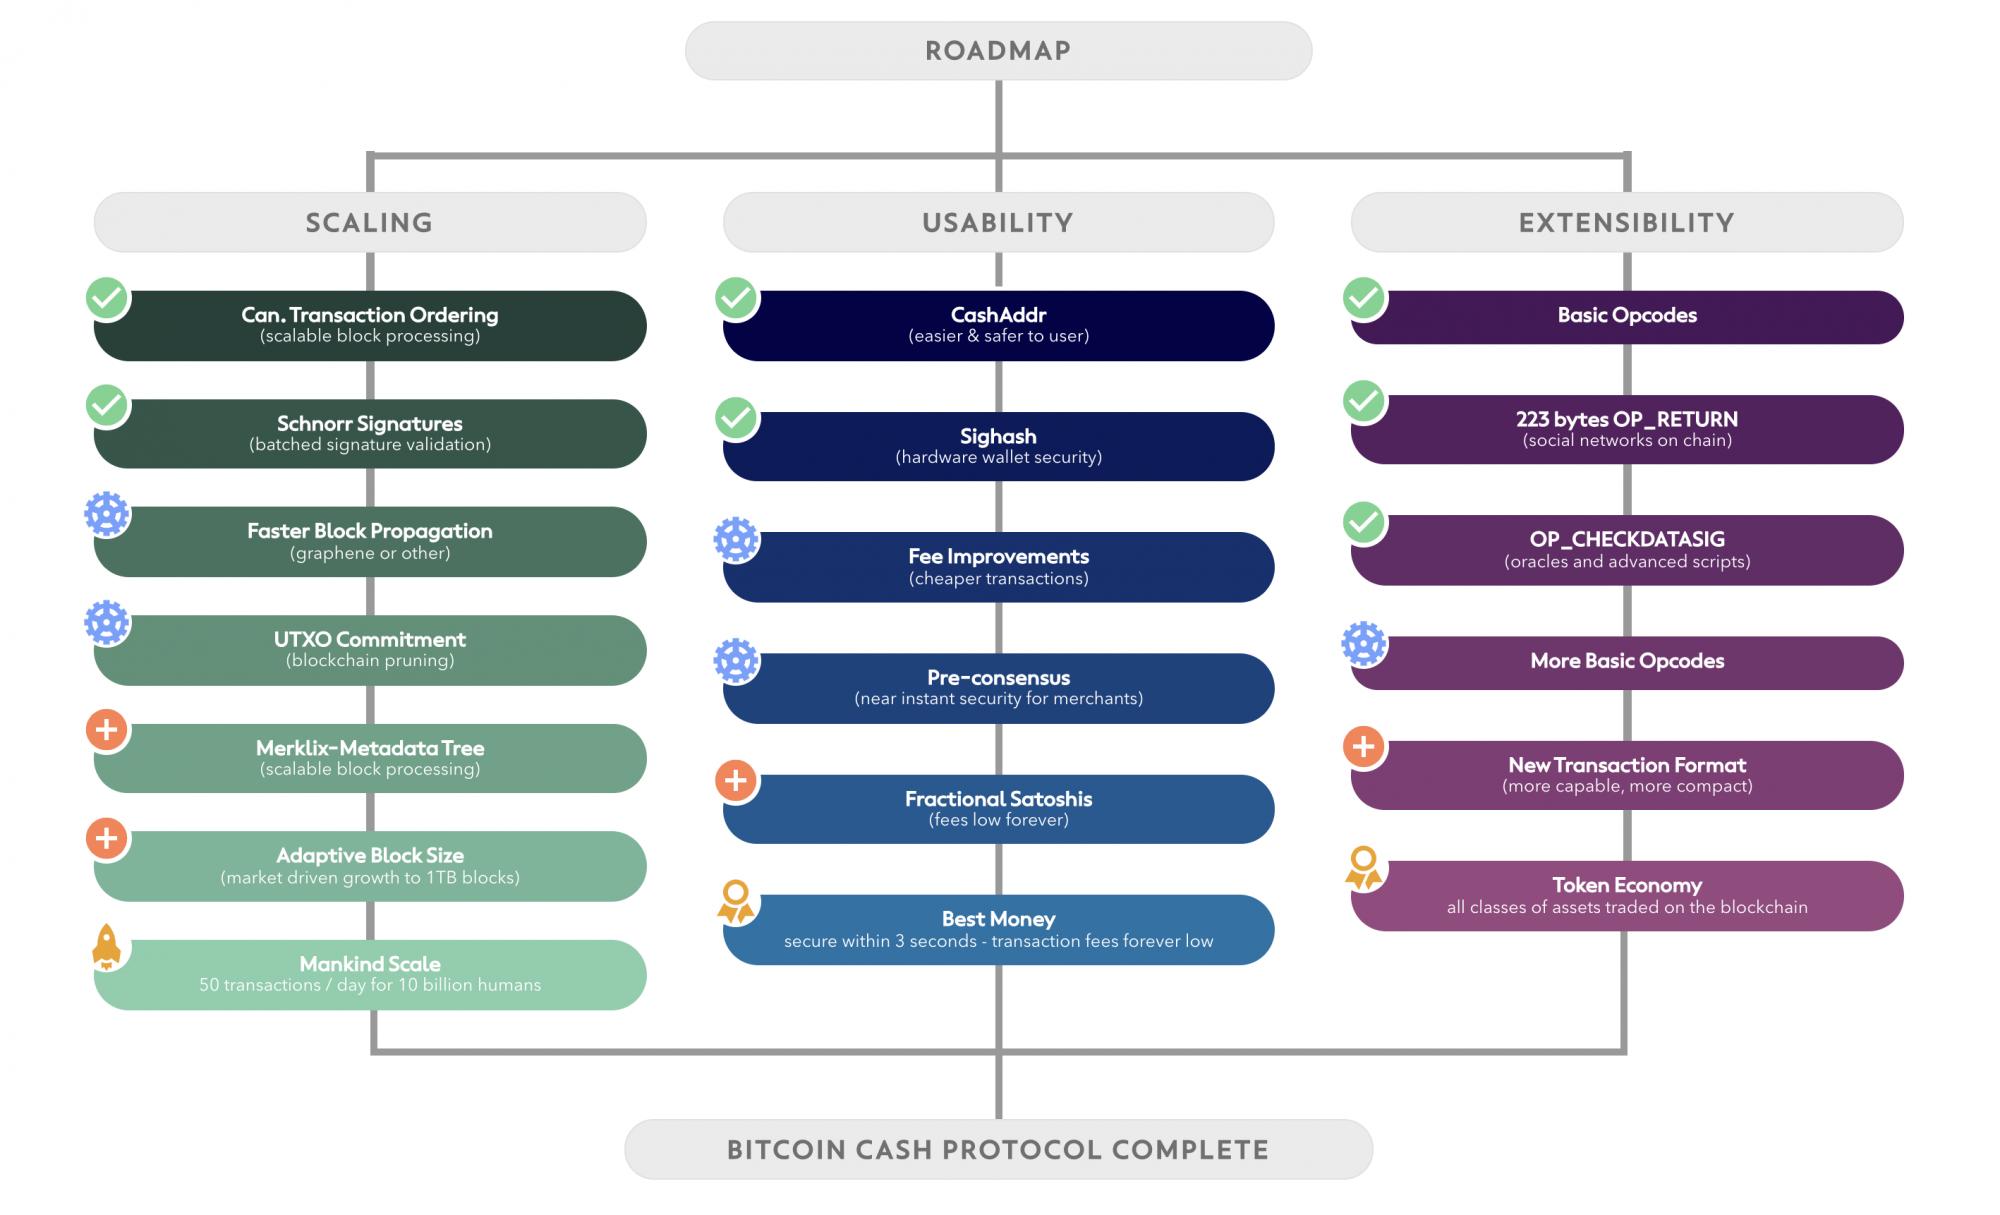 the early Bitcoin Cash roadmap